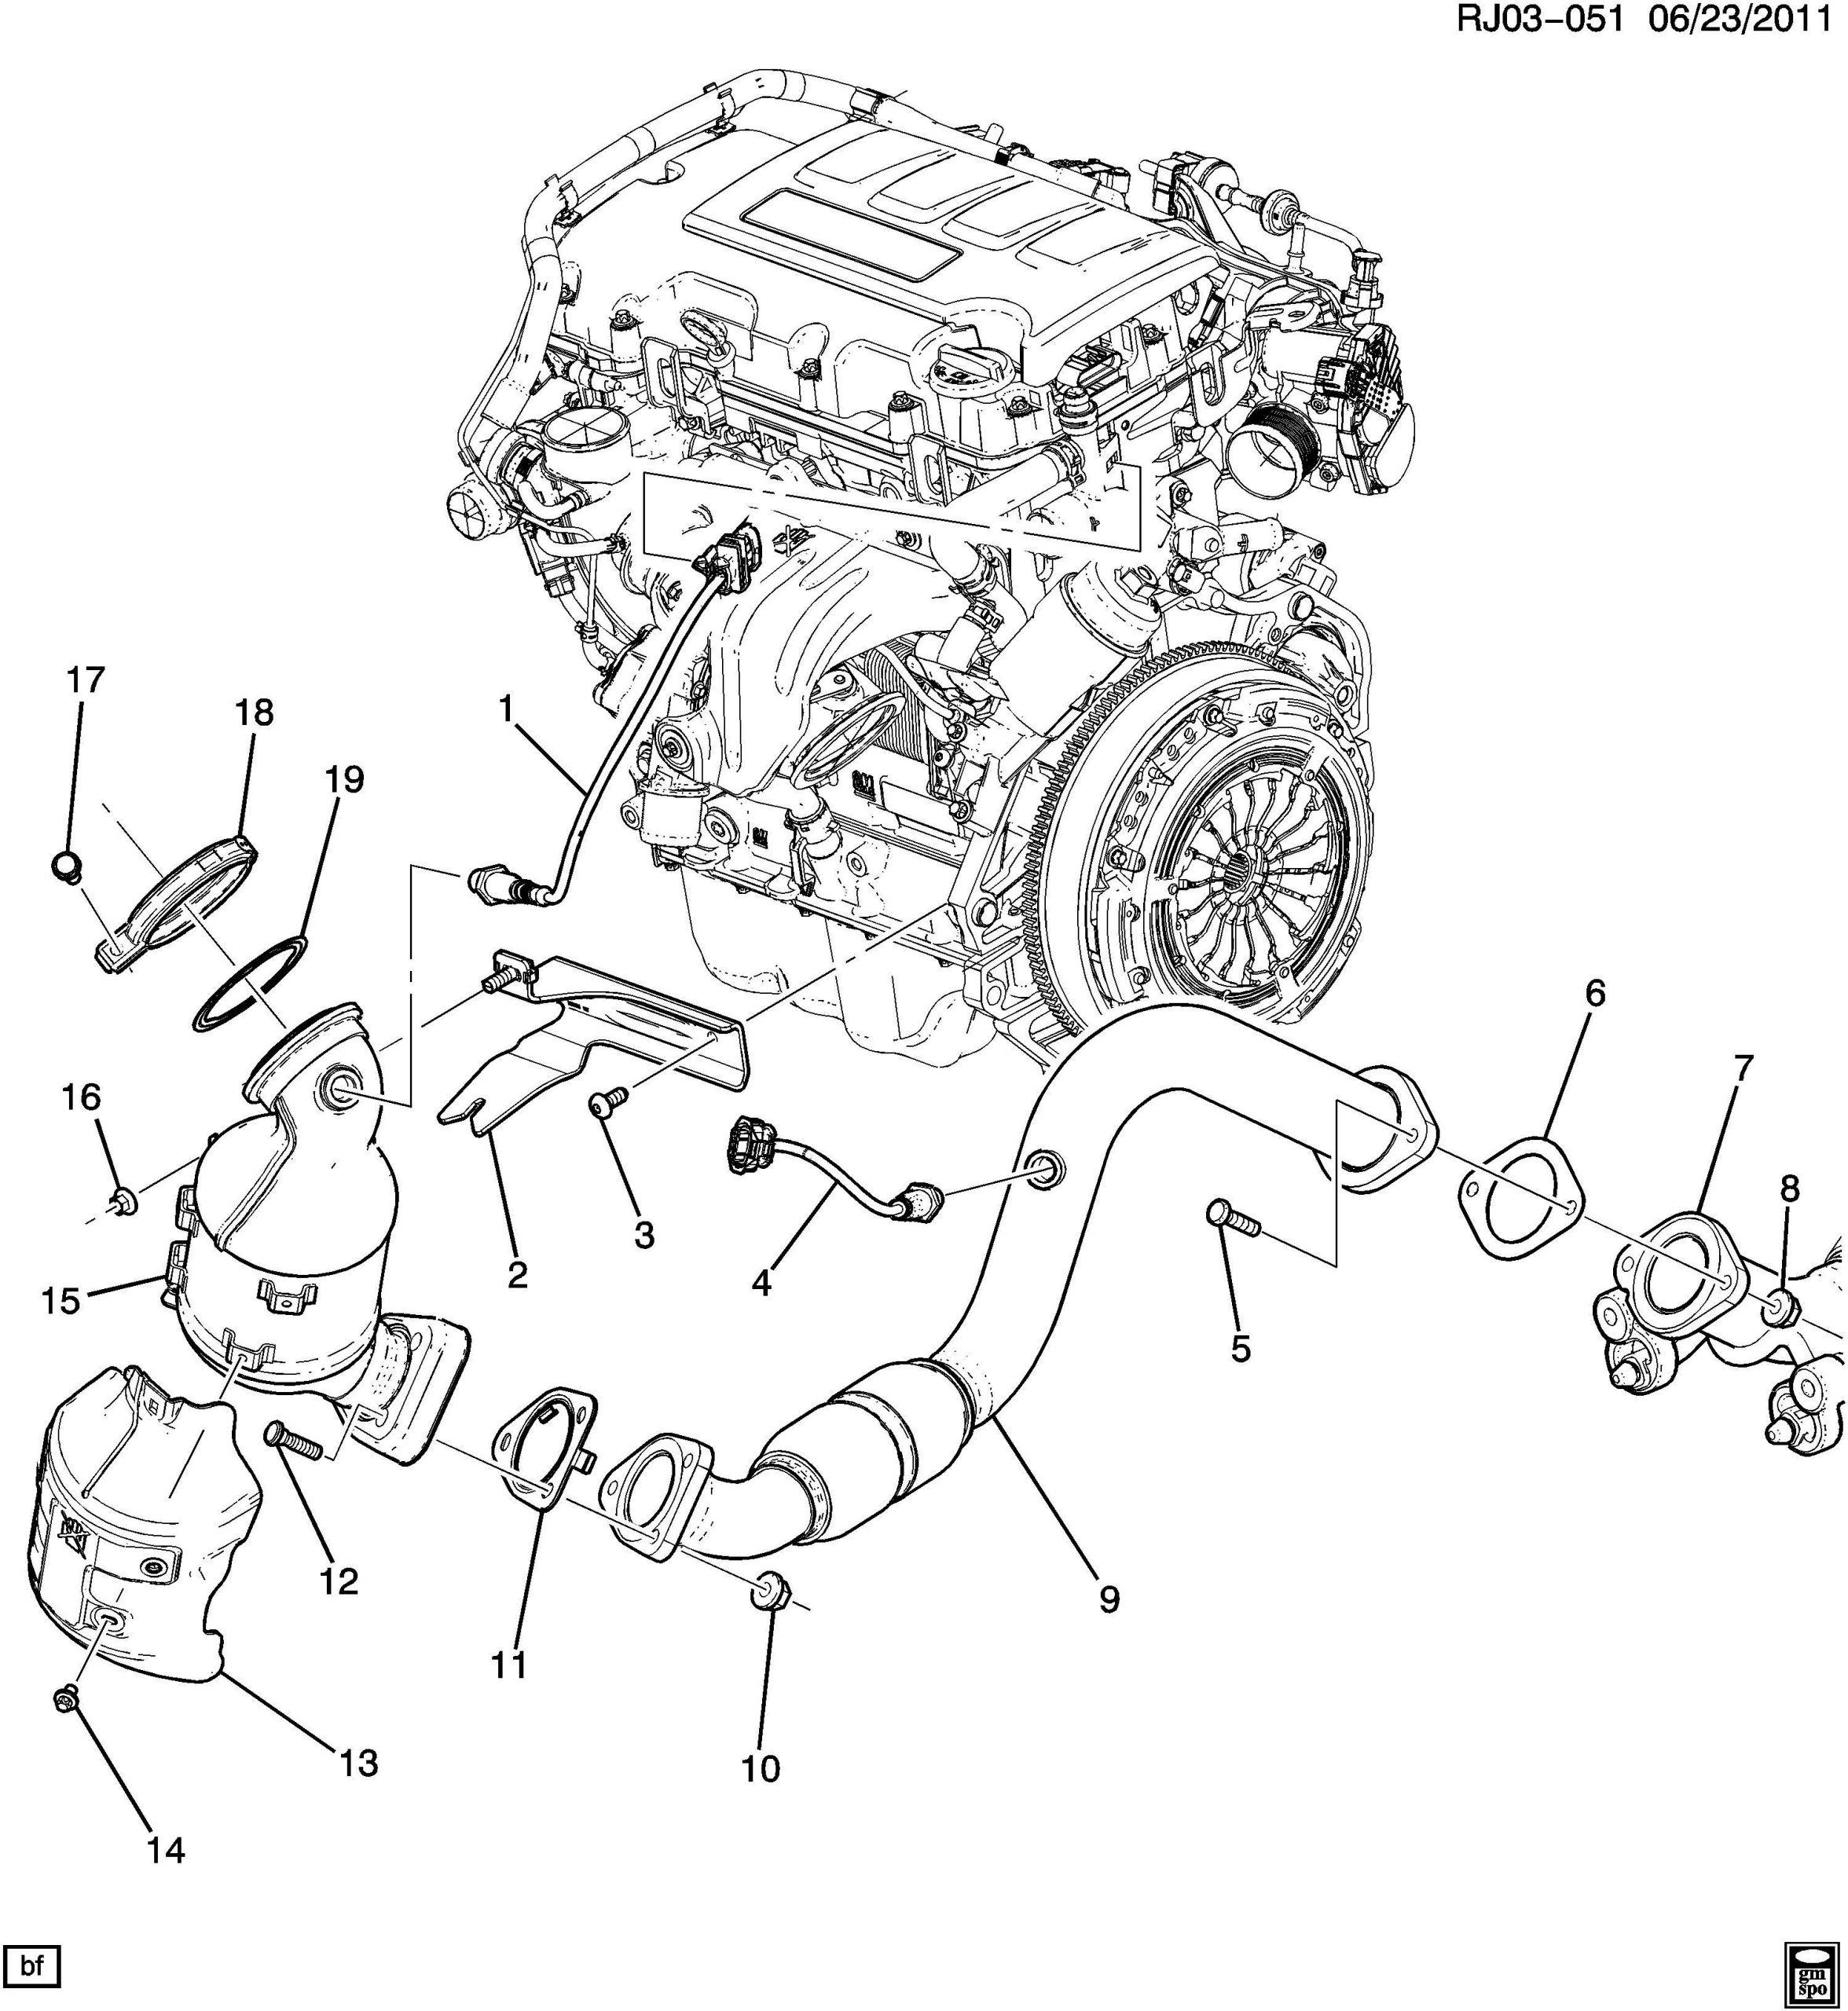 2012 Chevy Cruze 1.4 Motor Diagram 2012 Chevrolet Cruze 2ls Bolt Boltstudwasher Boltnutstudwasher Of 2012 Chevy Cruze 1.4 Motor Diagram